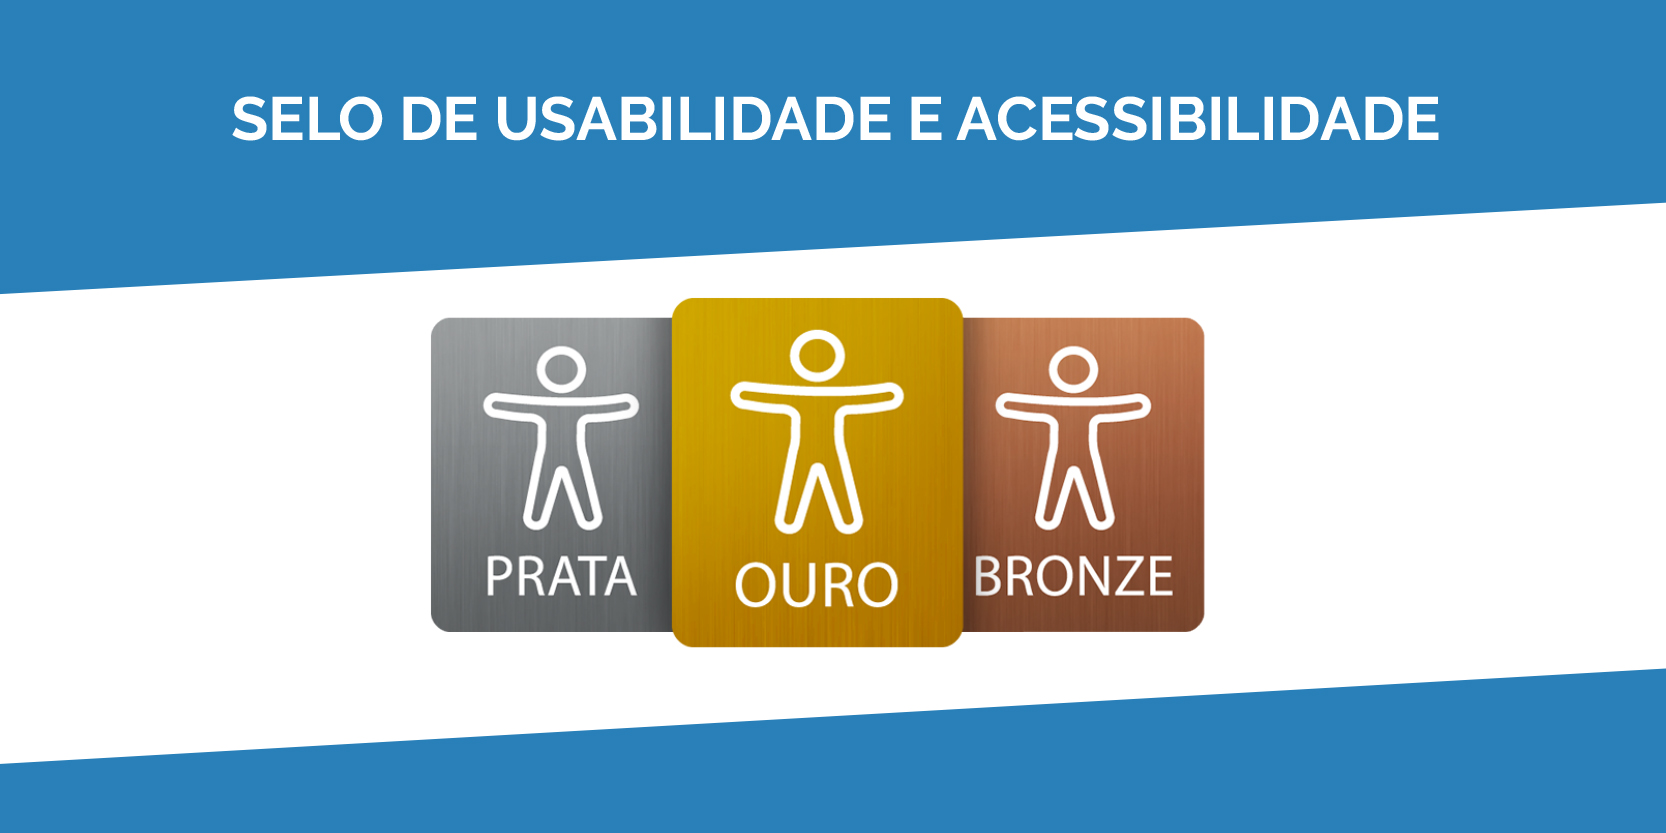 Selo de Usabilidade e Acessibilidade